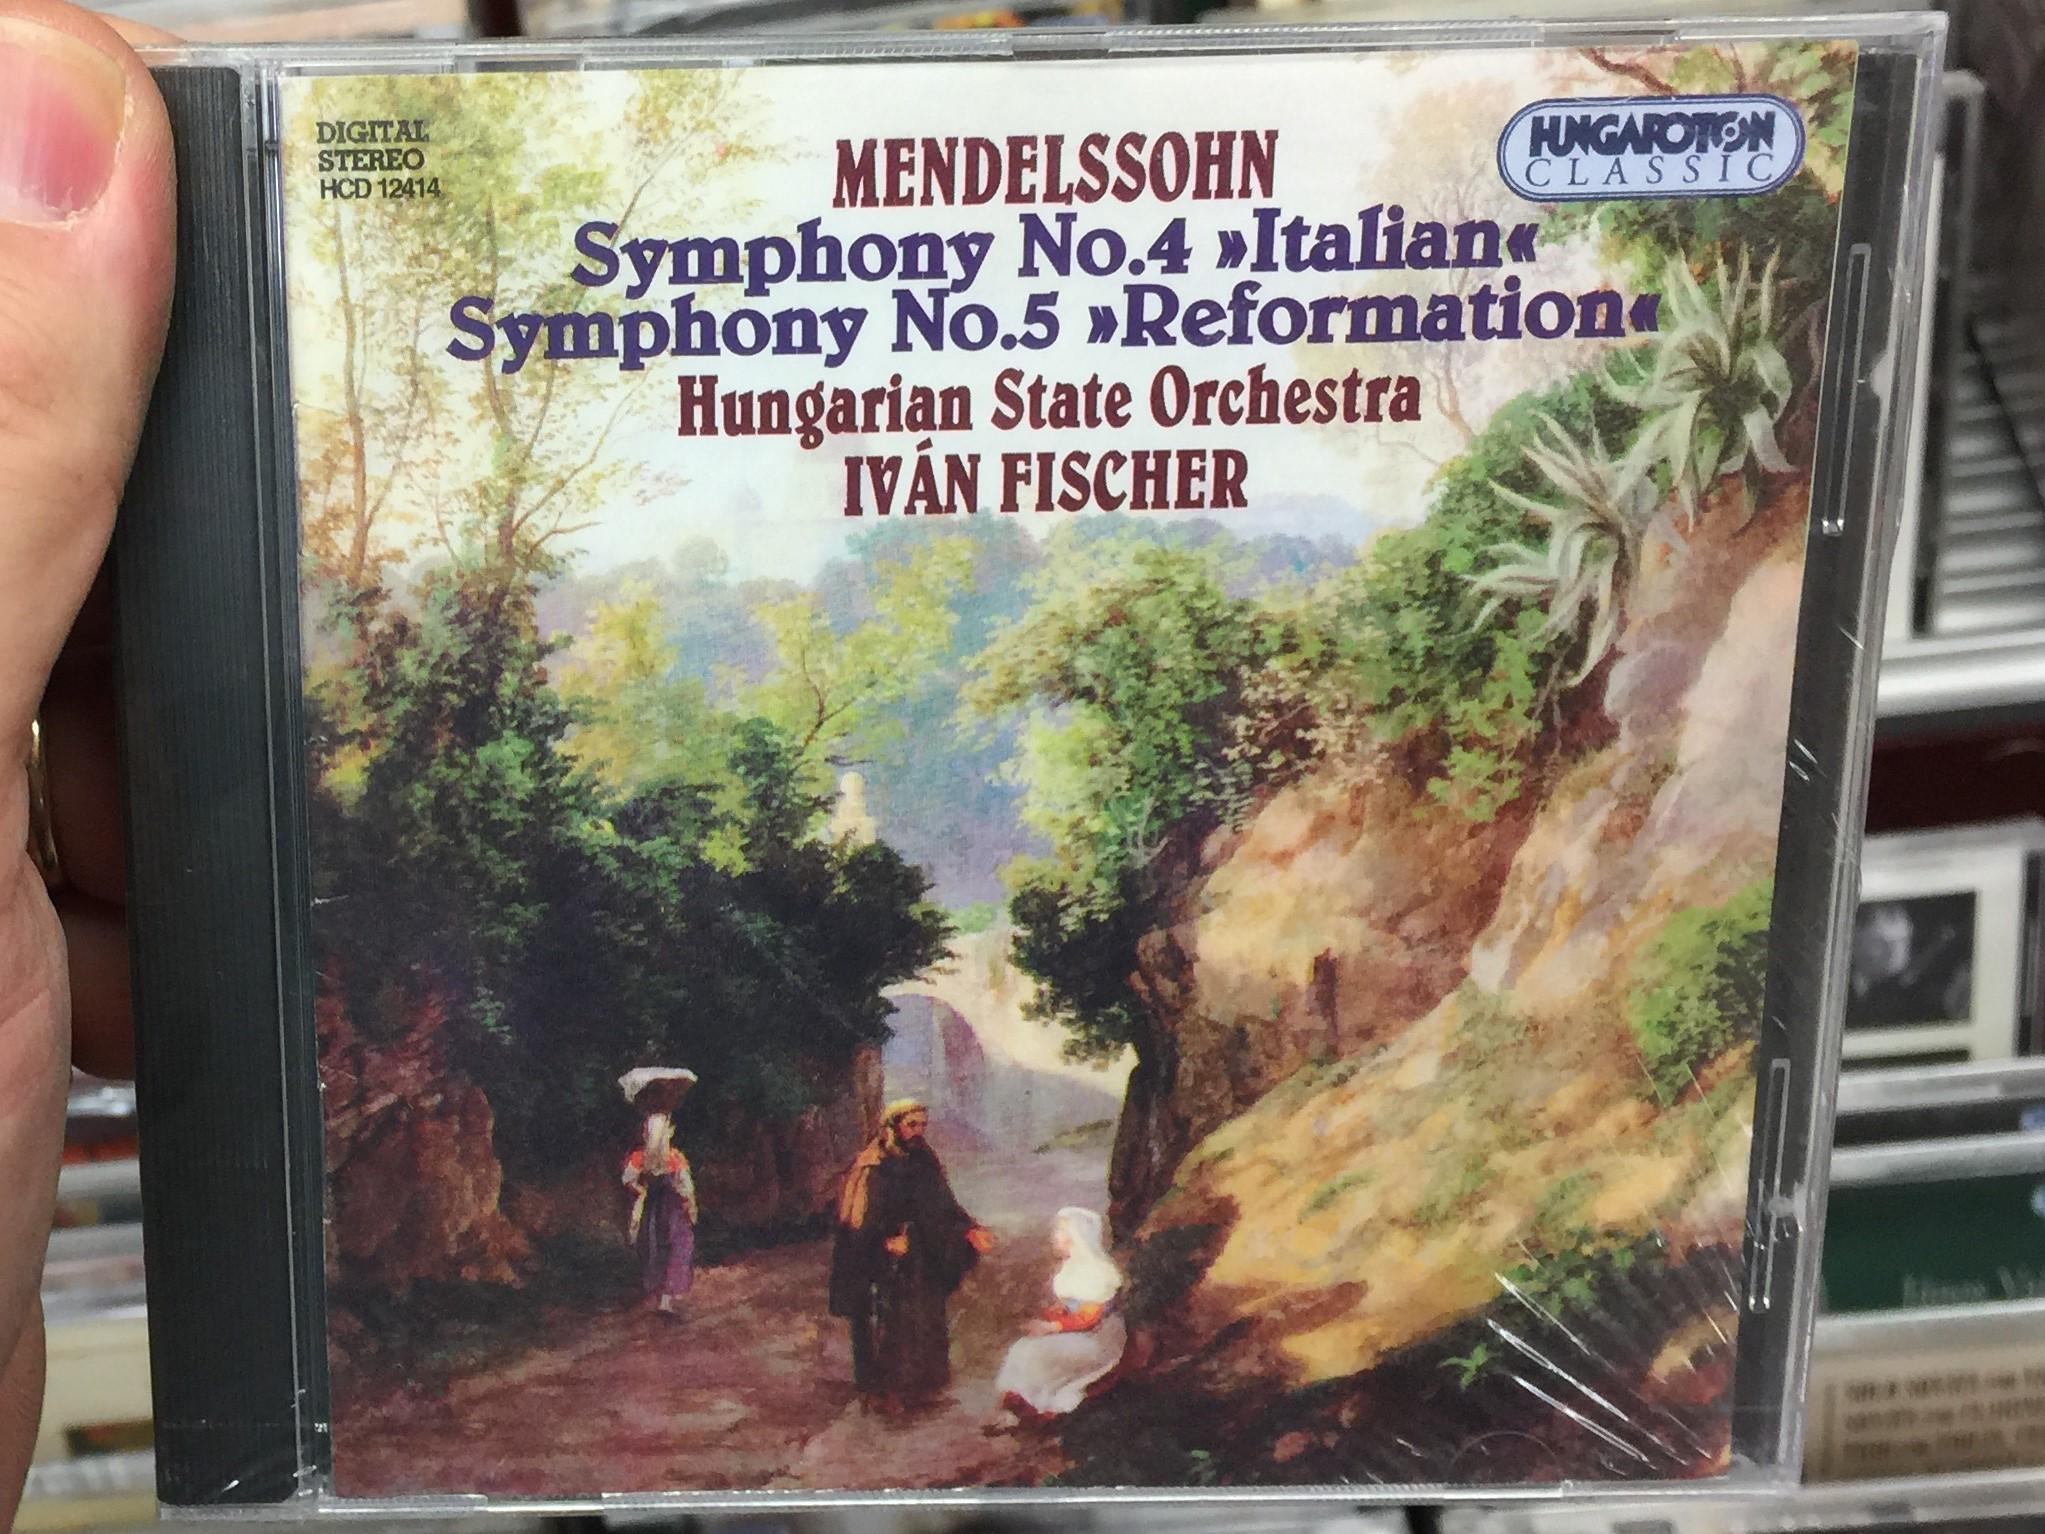 mendelssohn-symphony-no.4-italian-symphony-no.5-reformation-hungarian-state-orchestra-iv-n-fischer-hungaroton-classic-audio-cd-1995-stereo-hcd-12414-1-.jpg